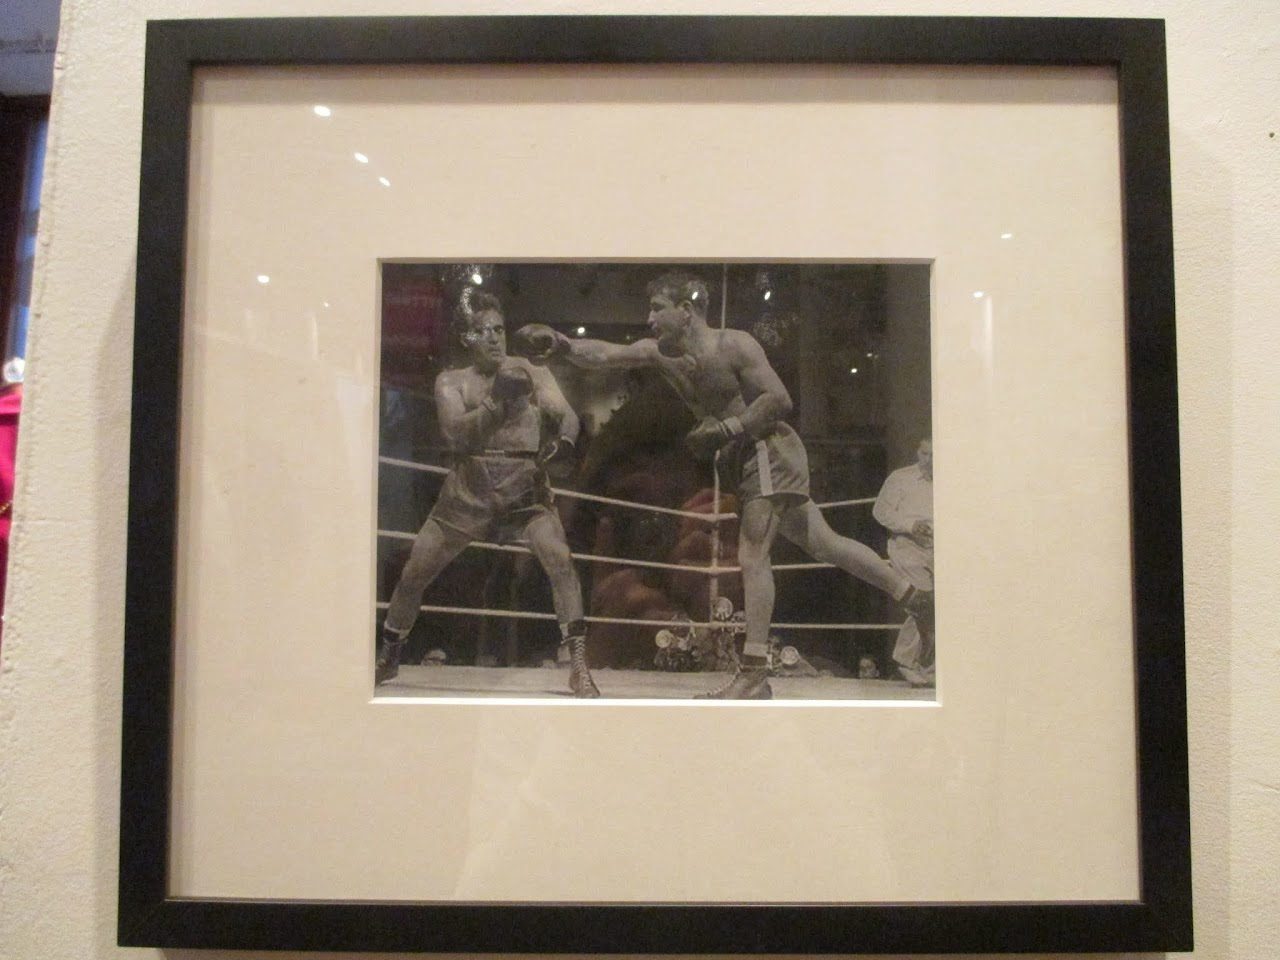 One Punch KO Photograph